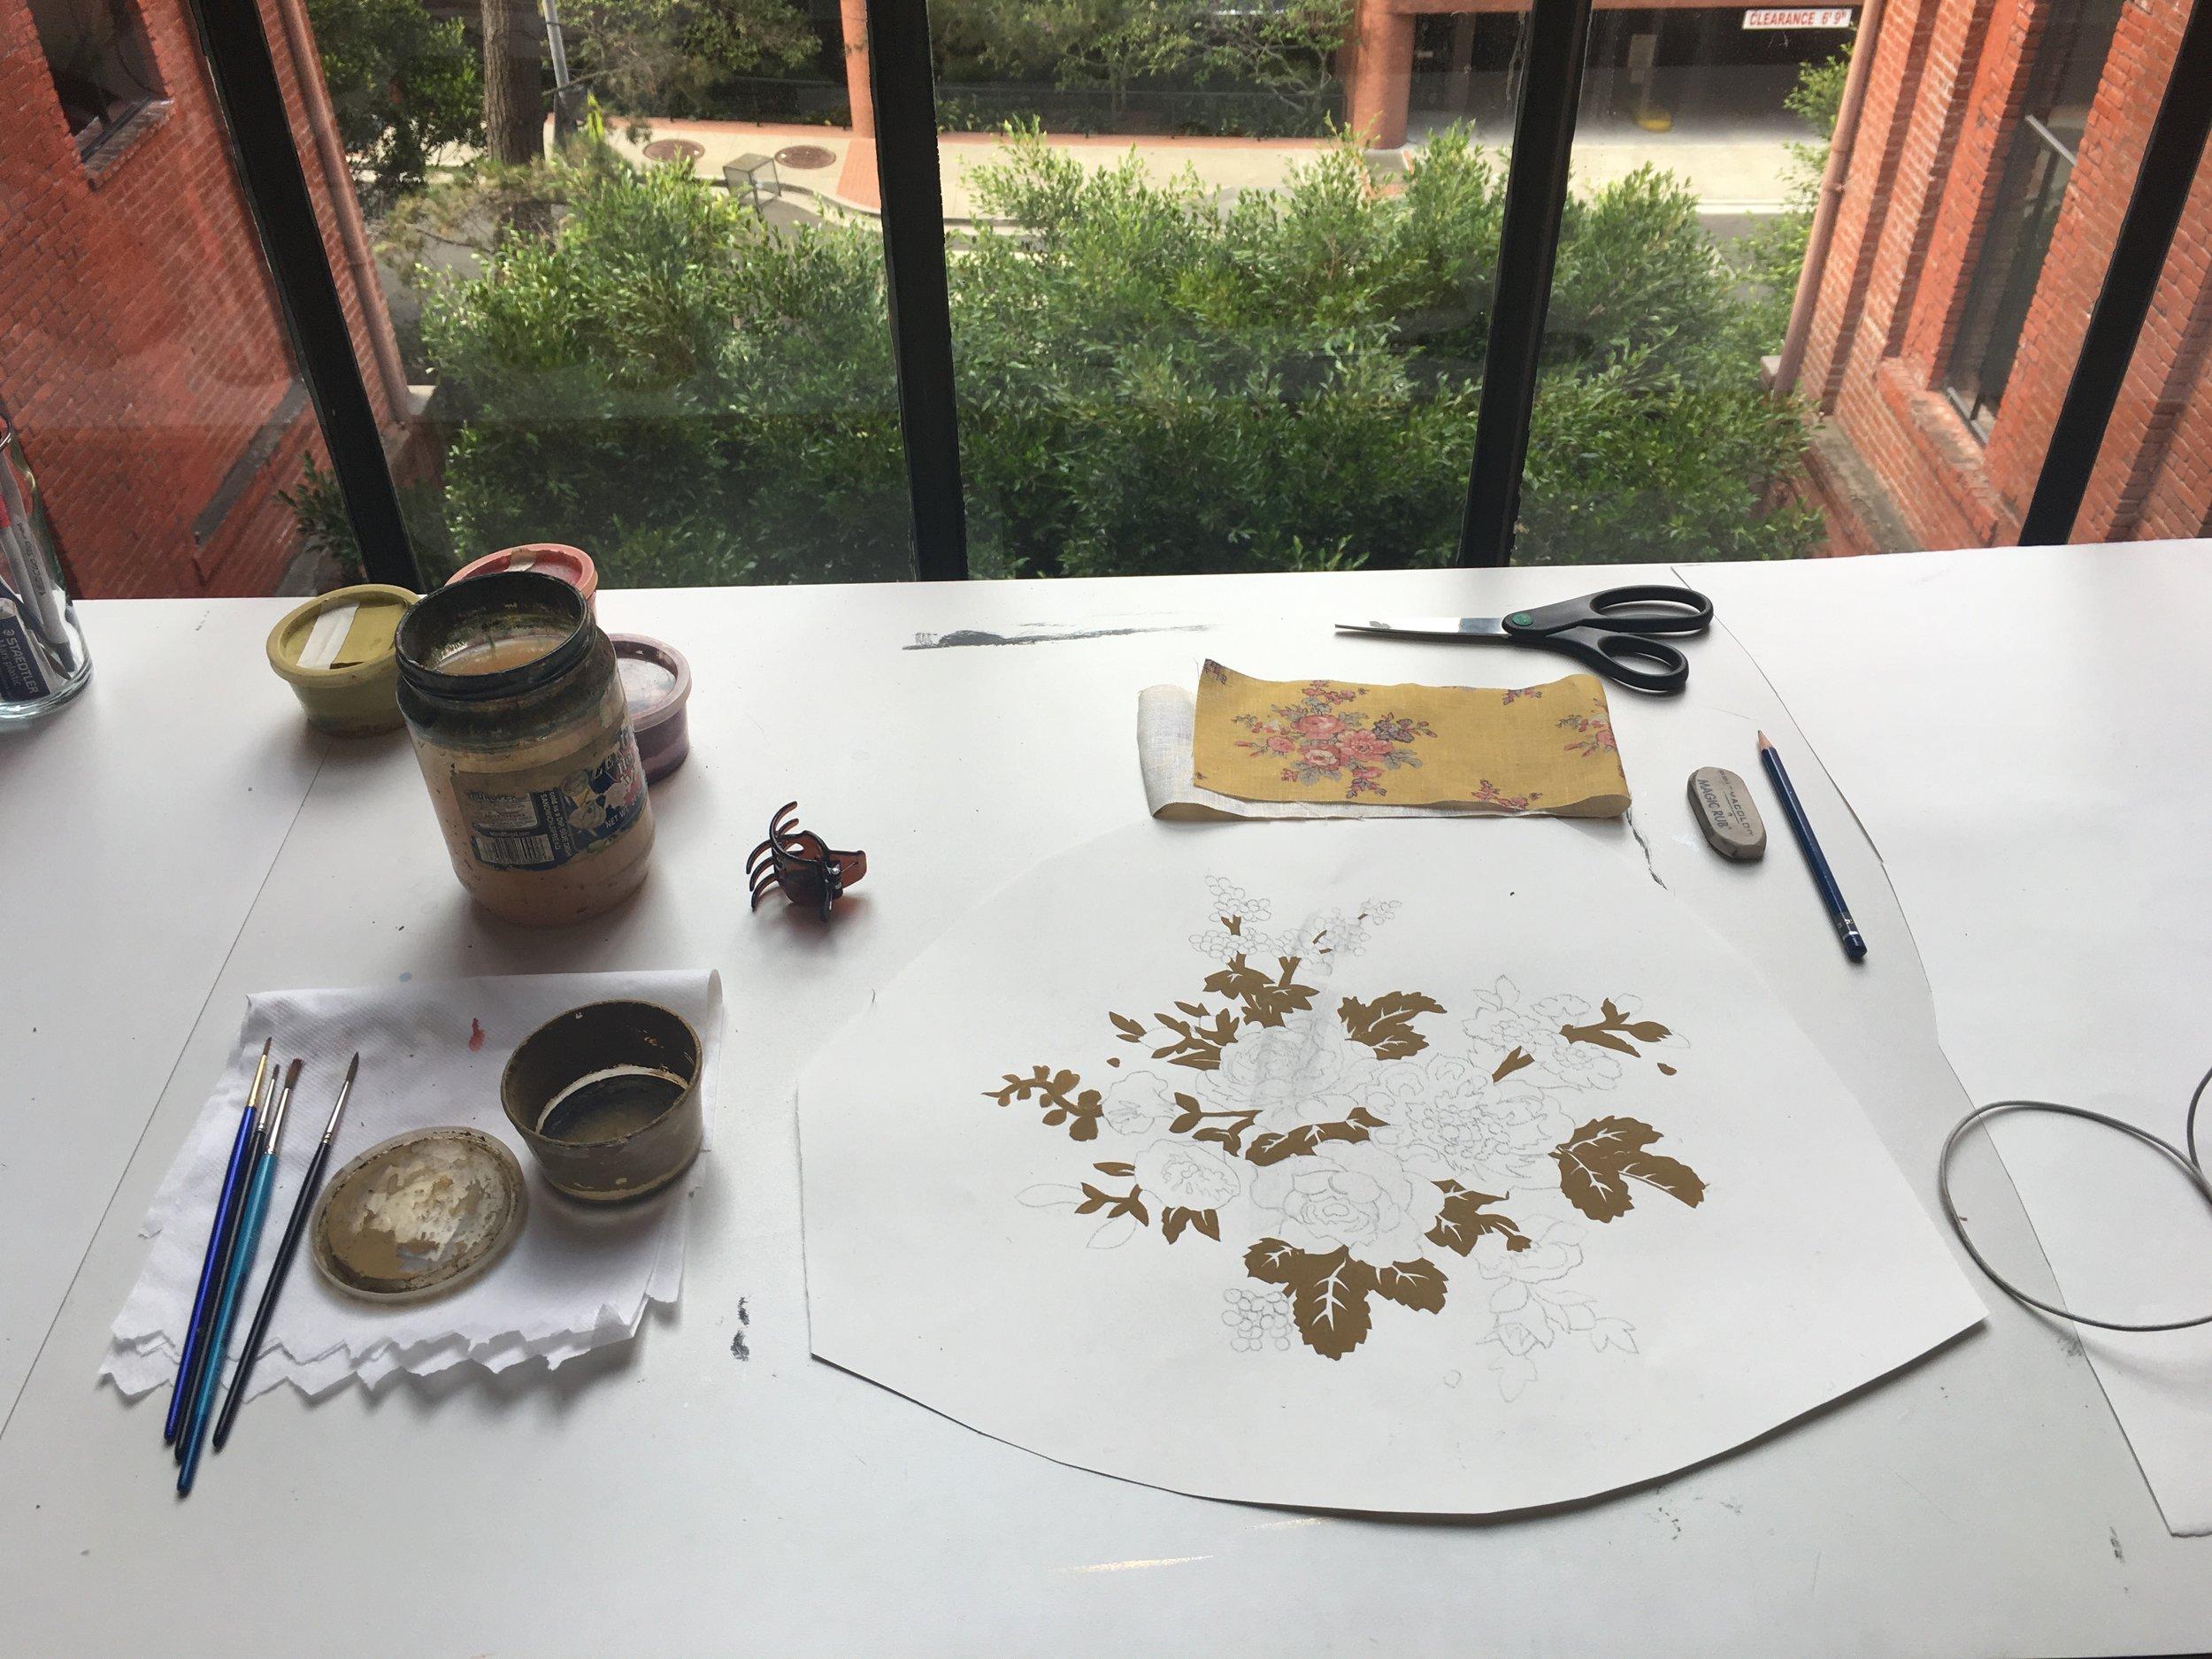 JV Ditsy Floral Process 2